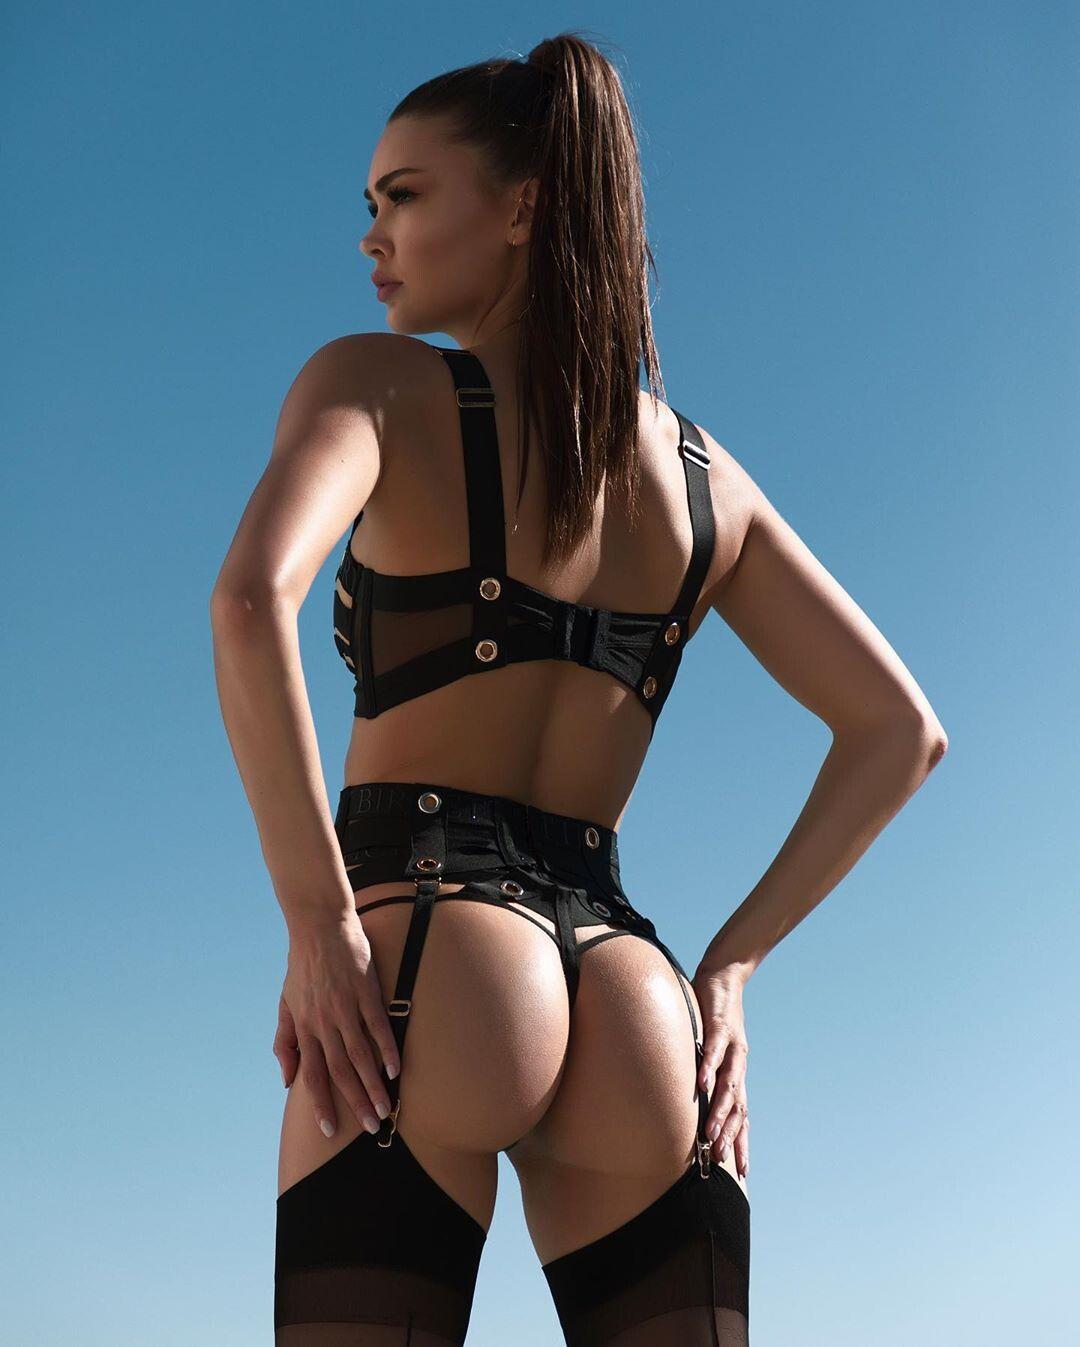 Jessica Nazarenus Stunning Body